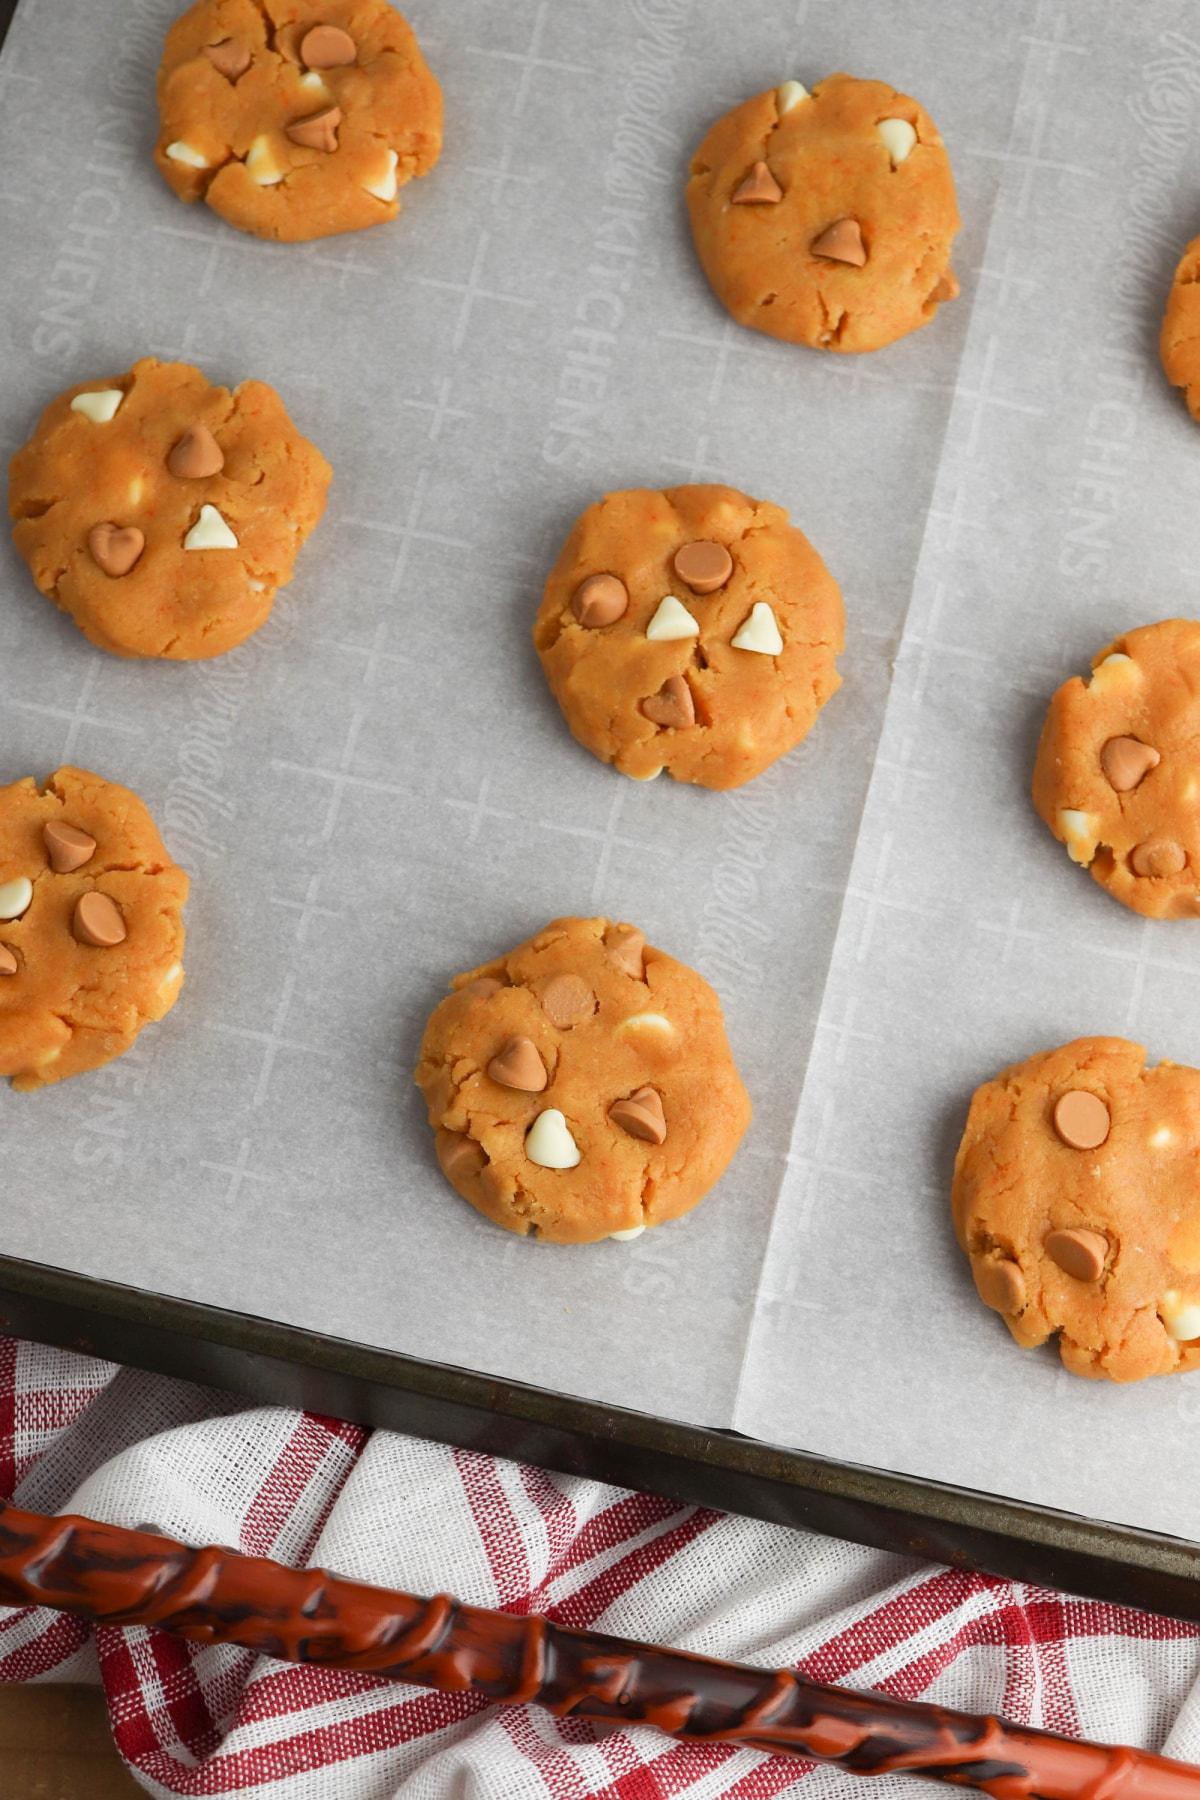 Butterbeer cookie dough on cookie sheet